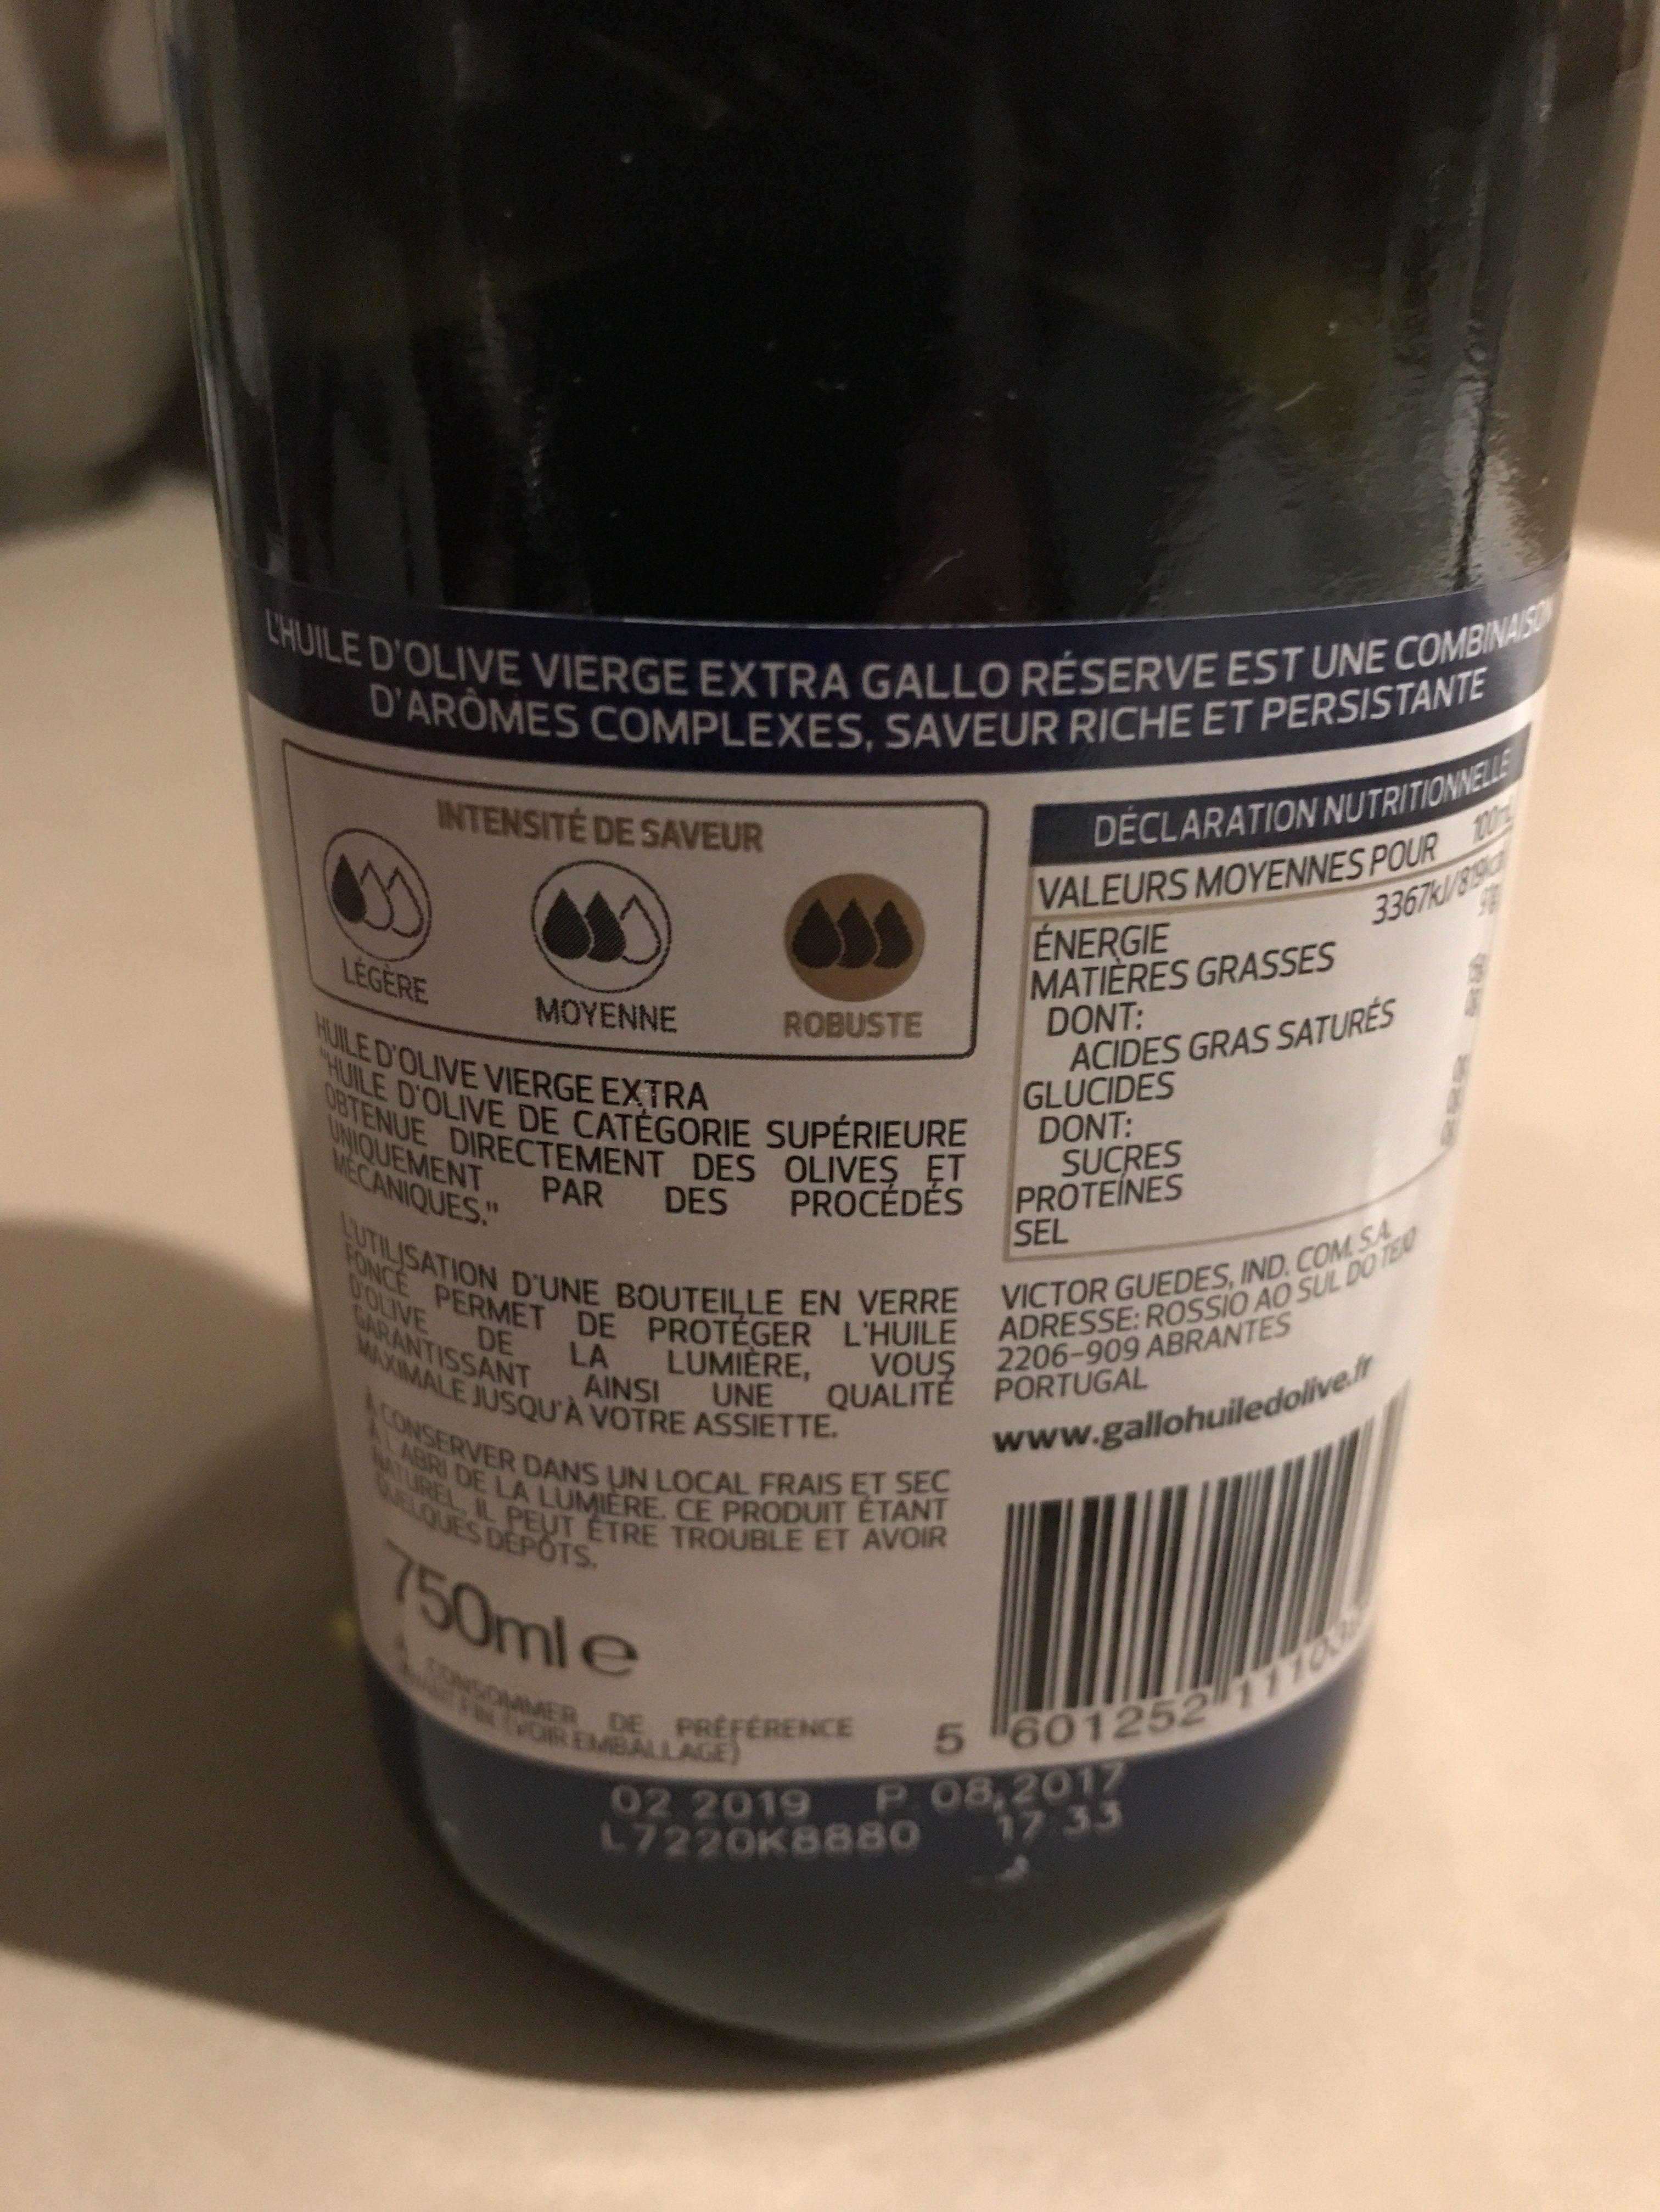 Réserve huile d'olive vierge extra - Ingredients - fr